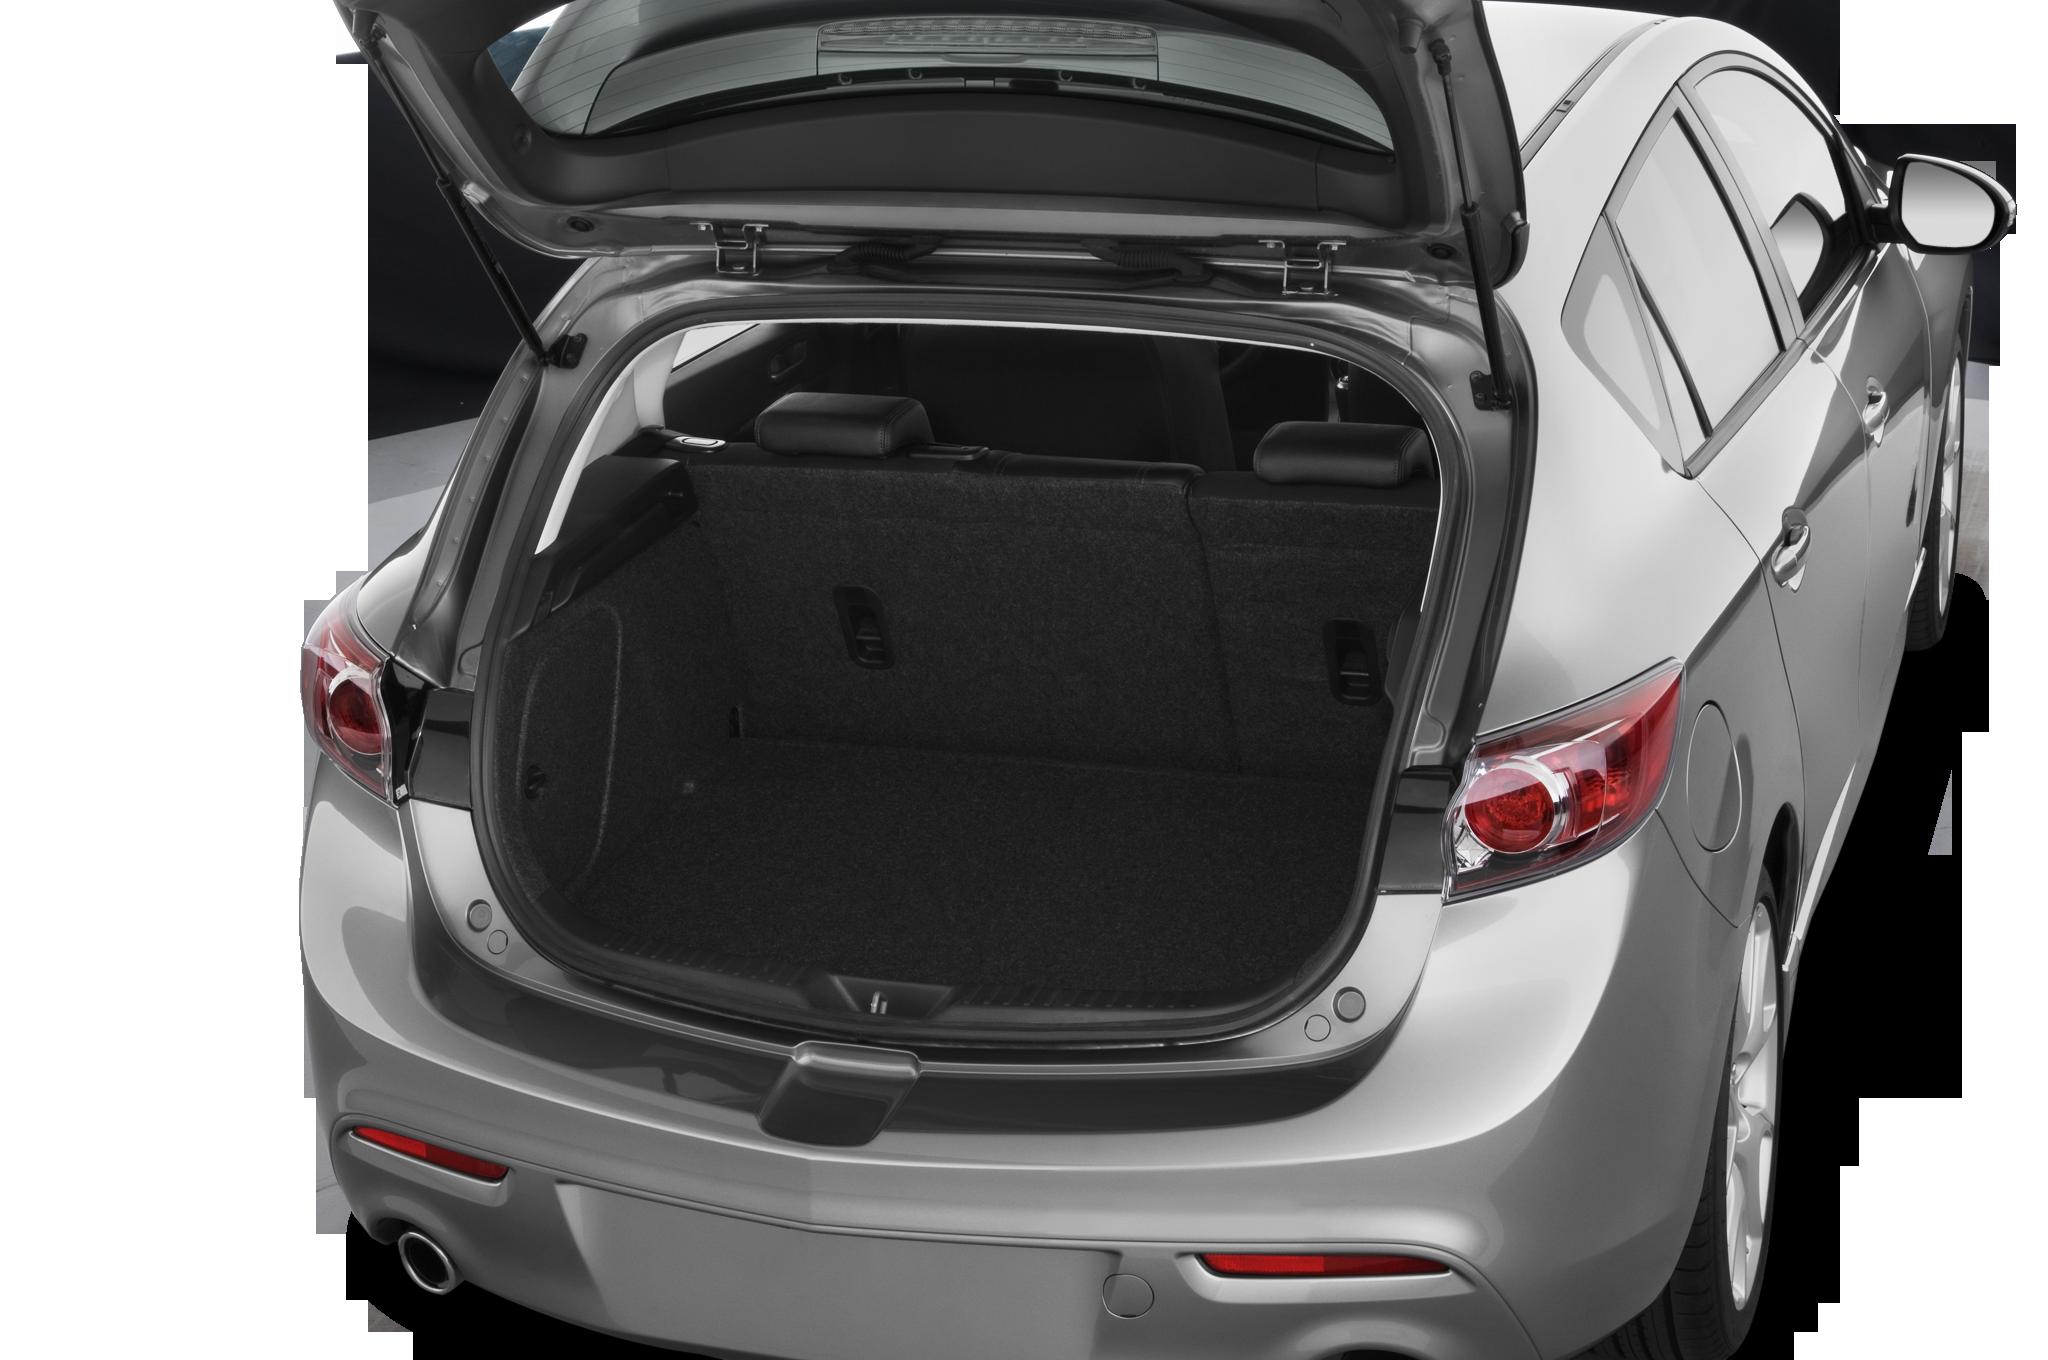 http://st.automobilemag.com/uploads/sites/10/2015/11/2010-mazda-mazdaspeed3-sport-5-door-wagon-trunk.png